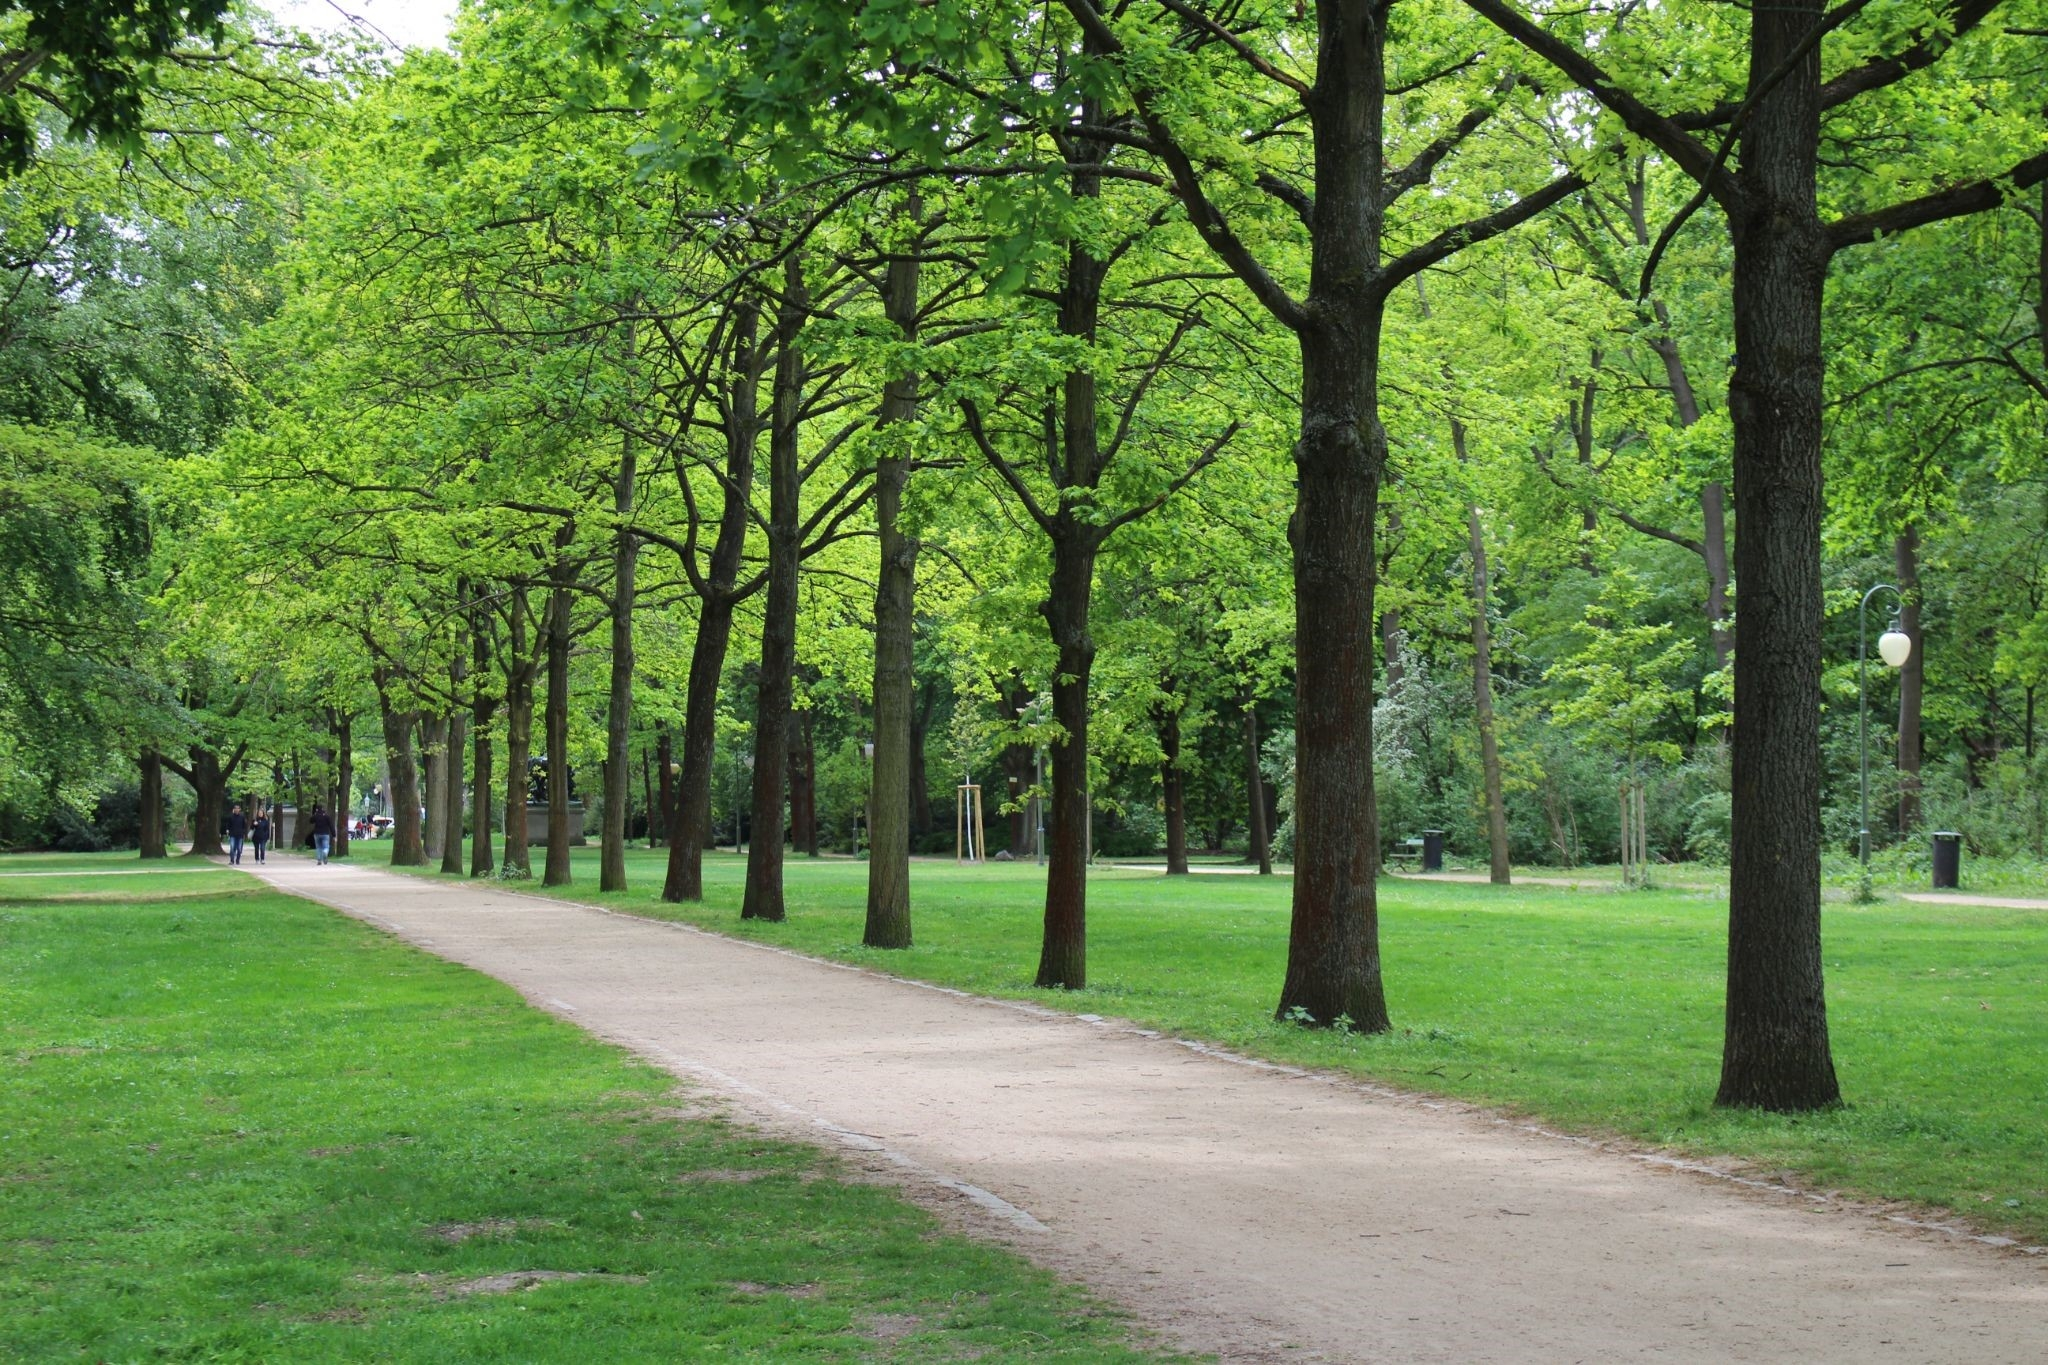 Park in Westchester